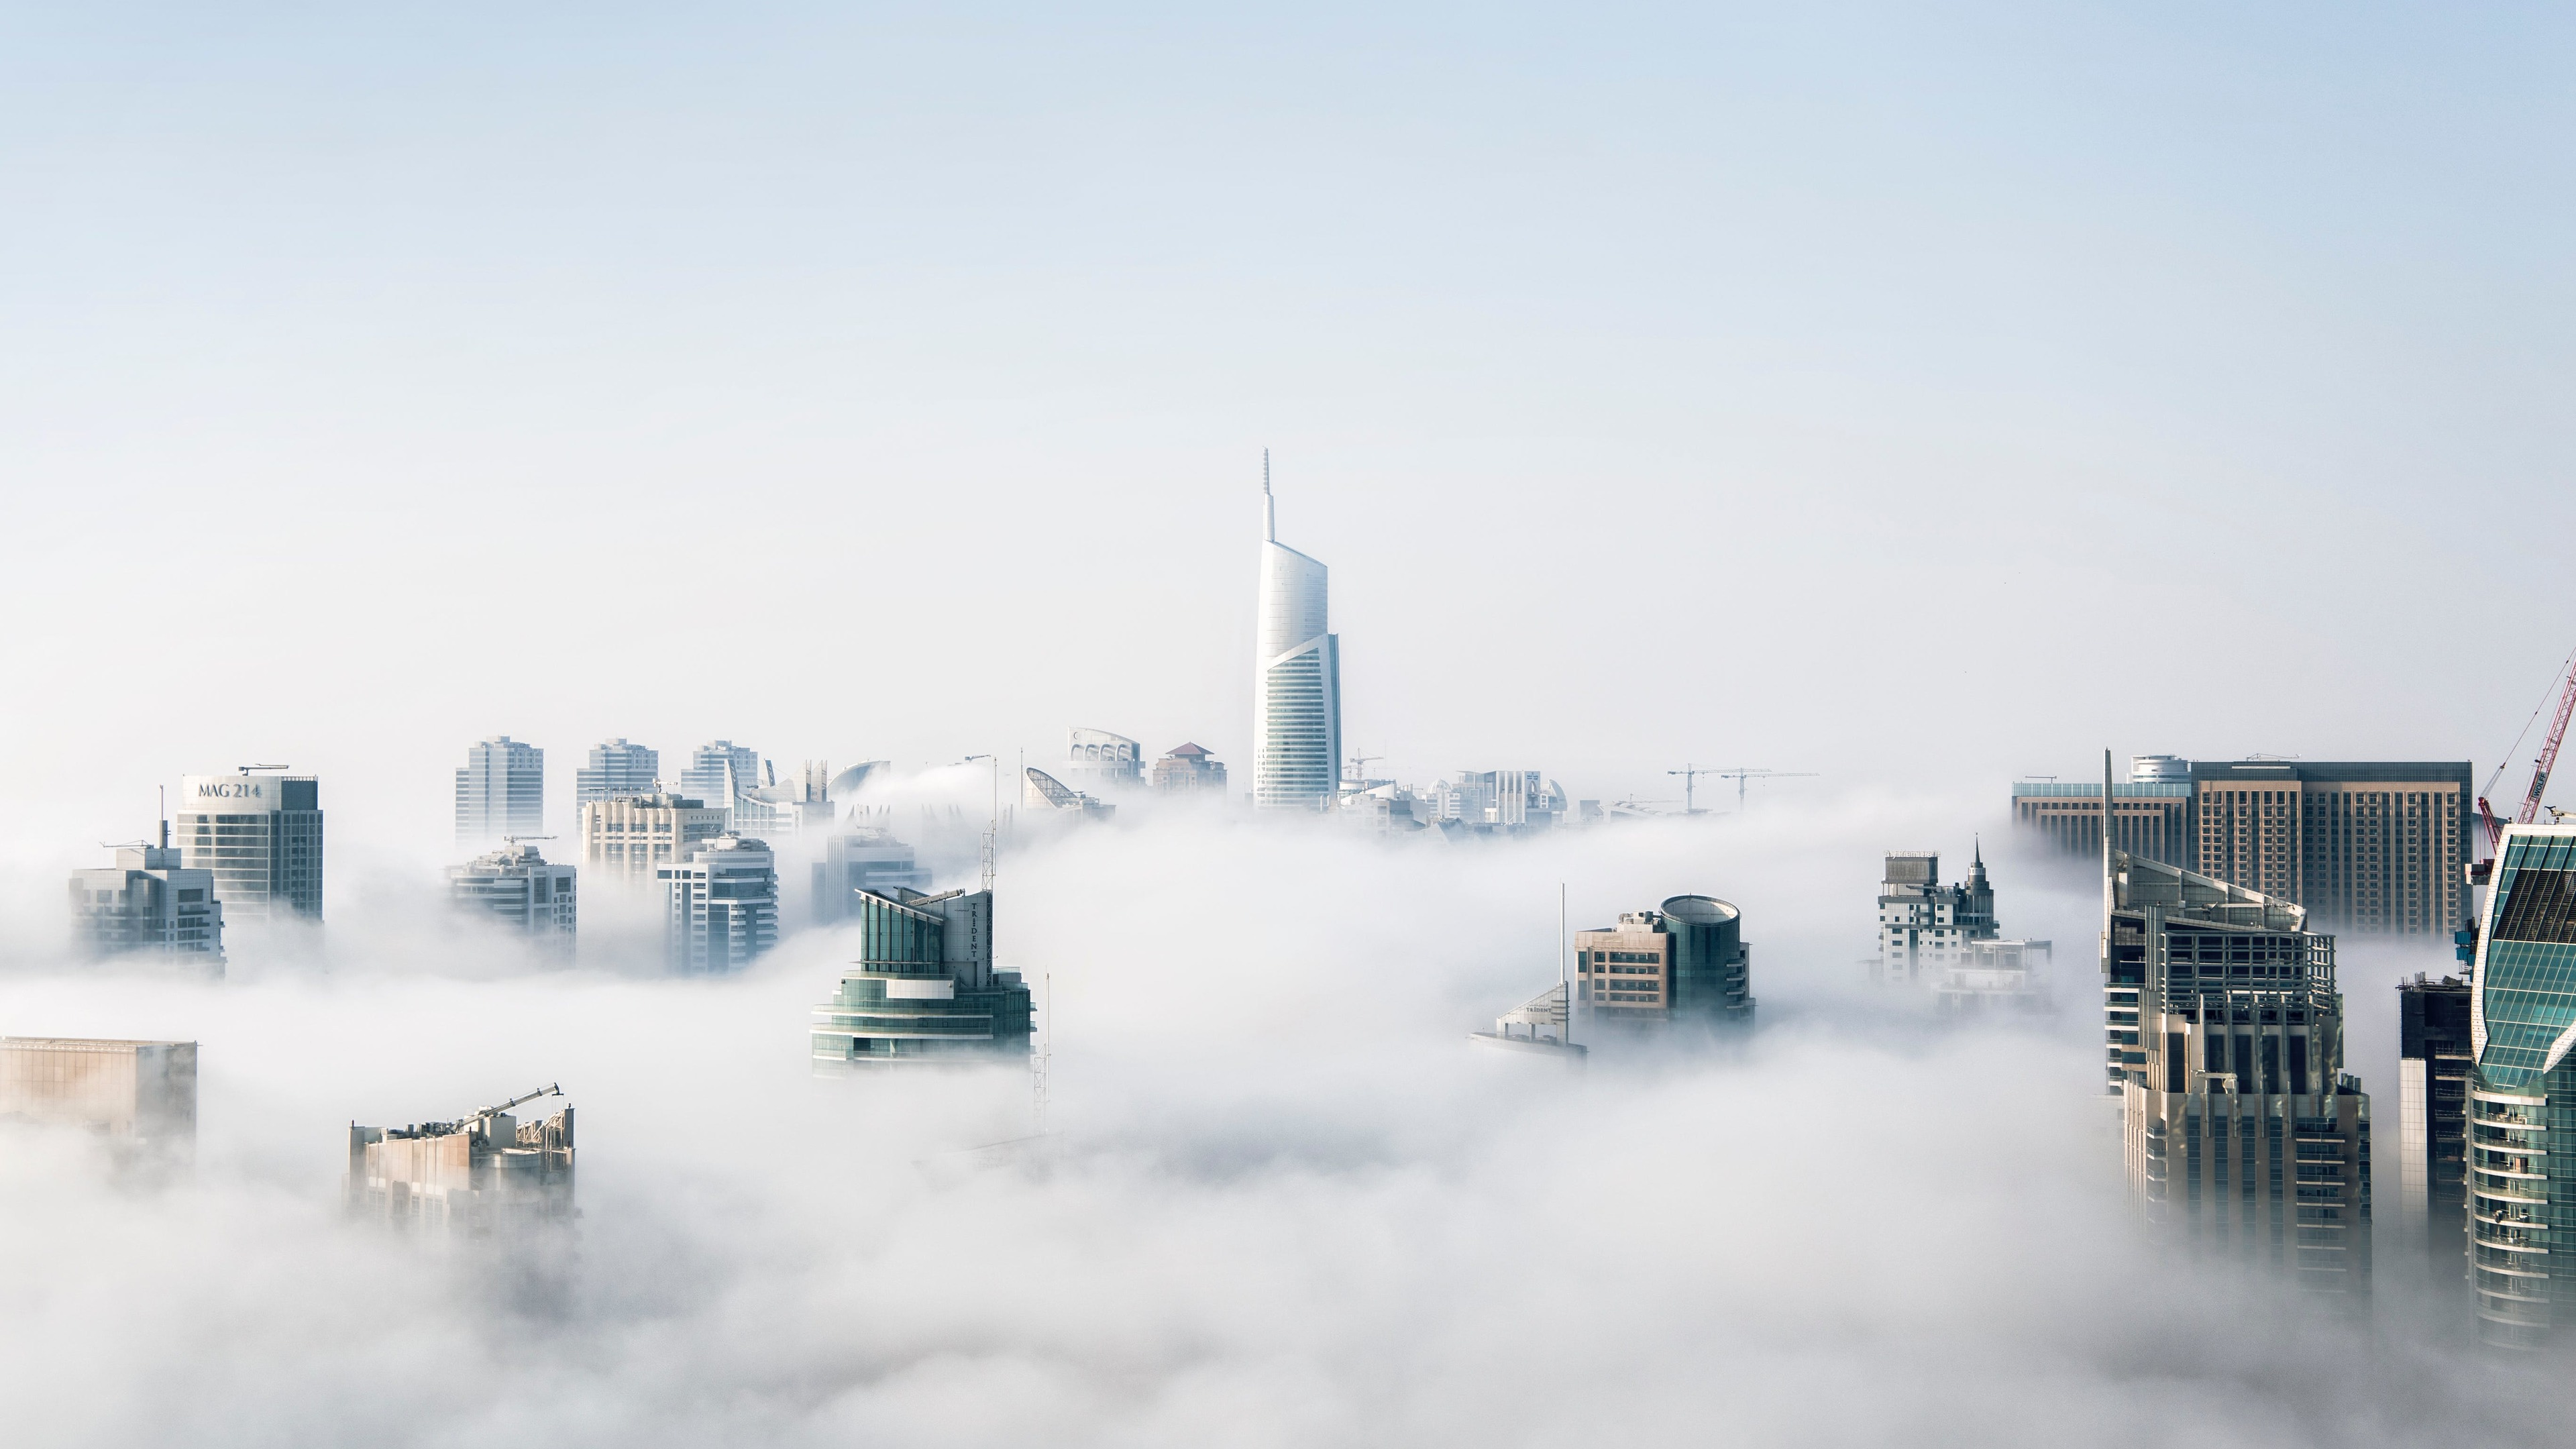 skyscraper buildings covered in fog 1540143654 - Skyscraper Buildings Covered In Fog - skyscraper wallpapers, nature wallpapers, hd-wallpapers, fog wallpapers, cityscape wallpapers, buildings wallpapers, 4k-wallpapers